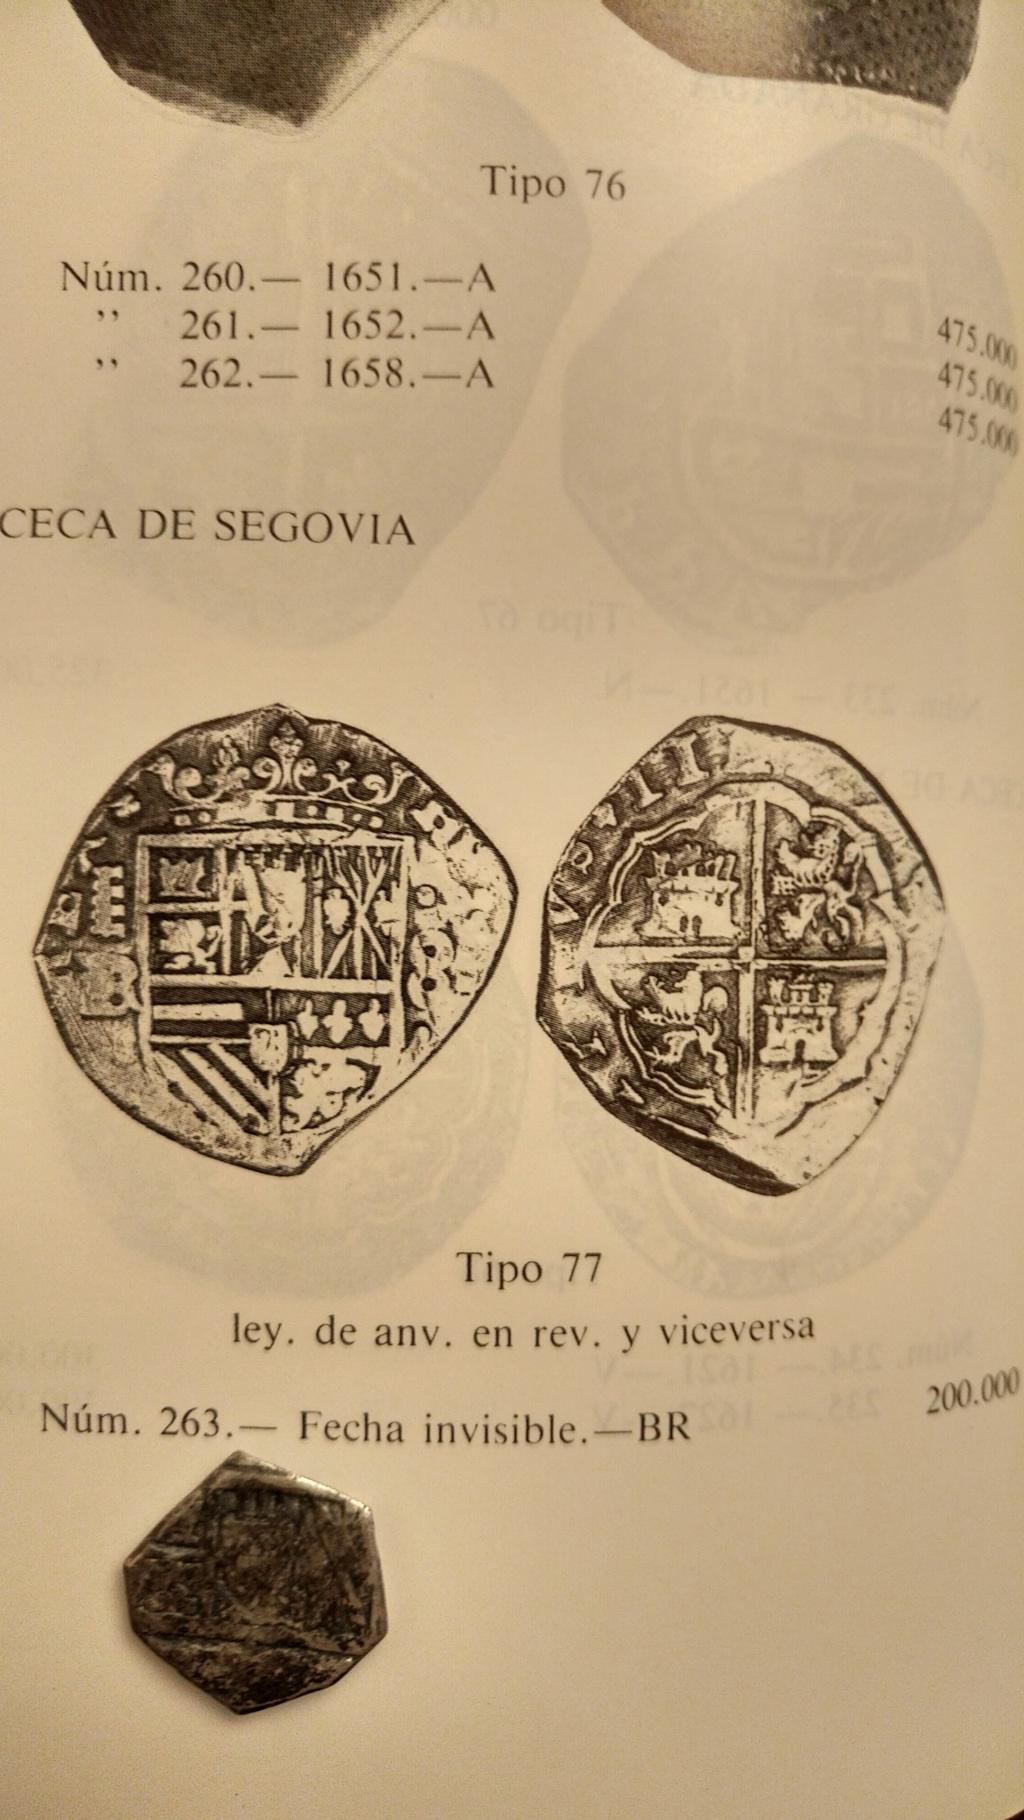 Real de a 2 de plata (6 g.), Felipe IV, recortada. Img_2012